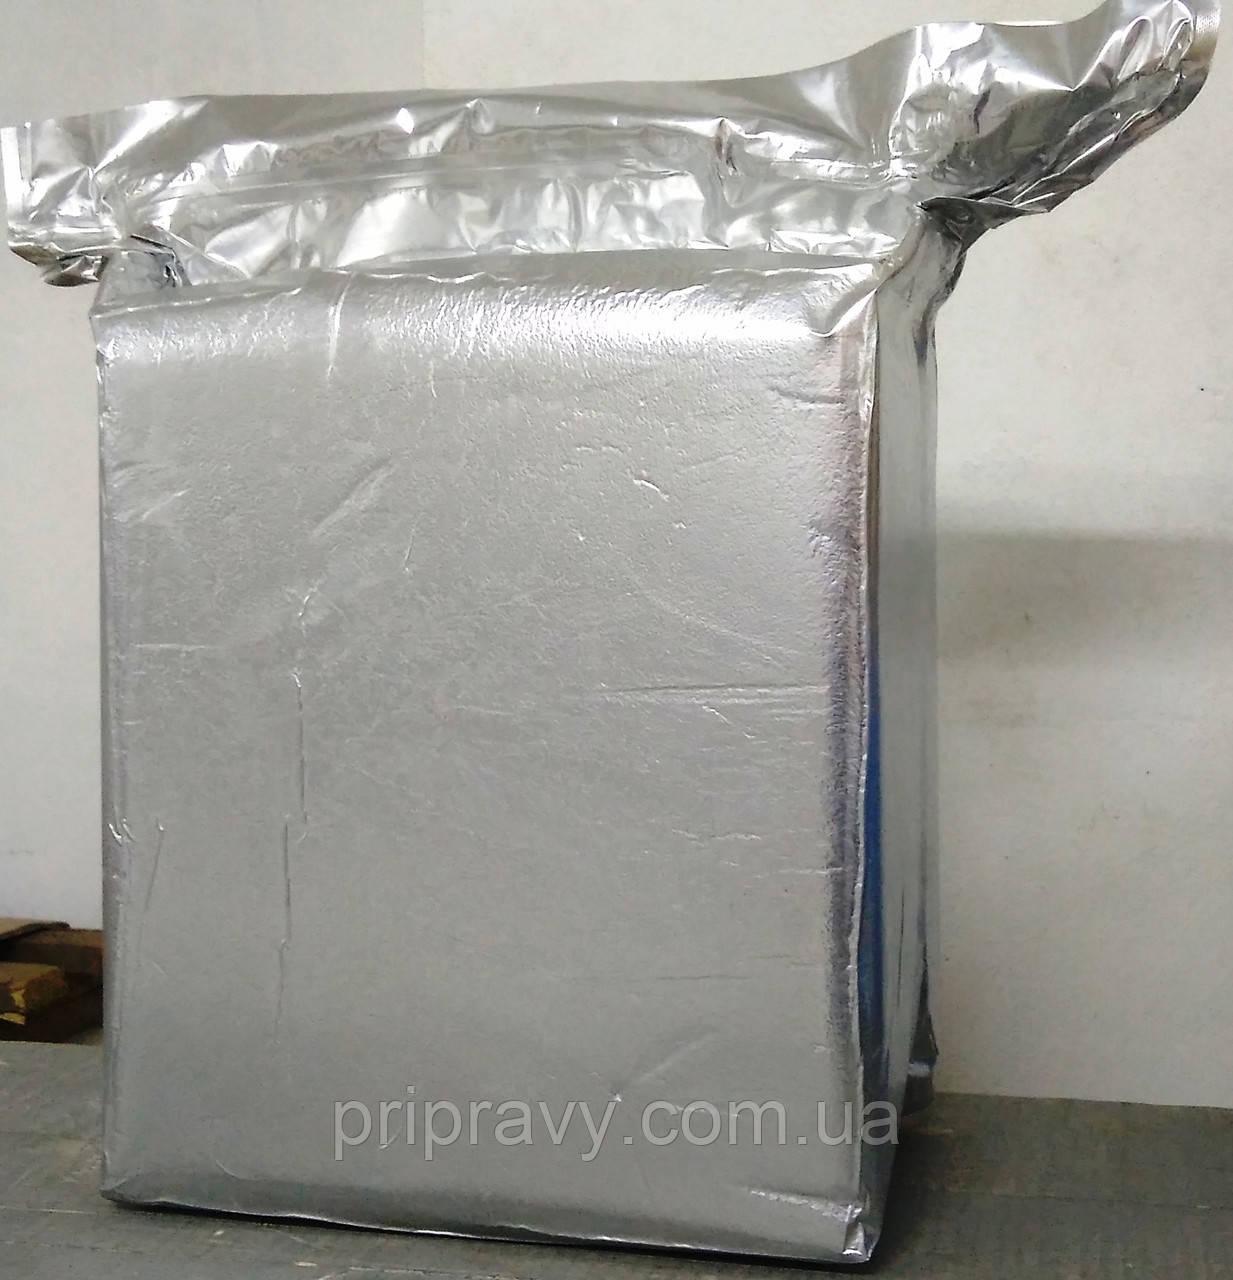 Дрожжи сухие  по 10 кг упаковка.